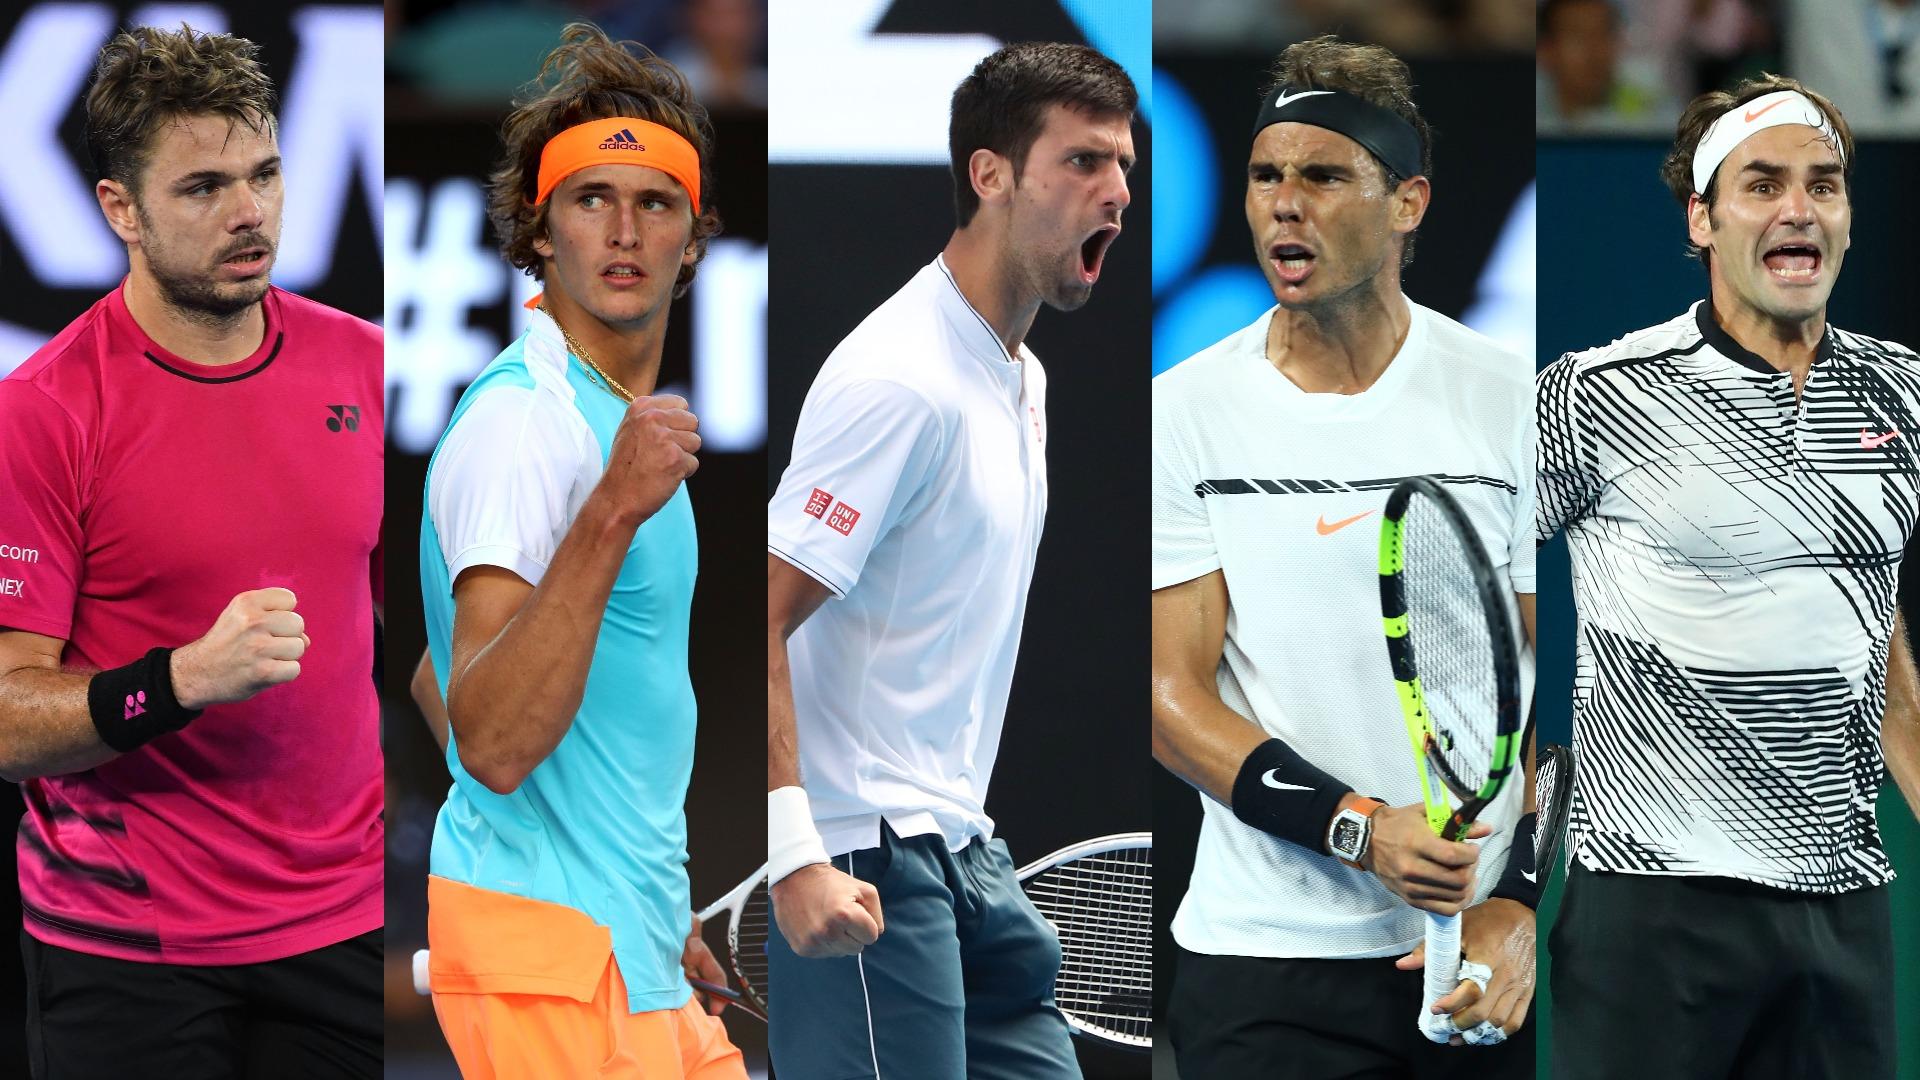 Australian Open men's draw: Novak Djokovic, Stan Wawrinka pose threat to Alexander Zverev